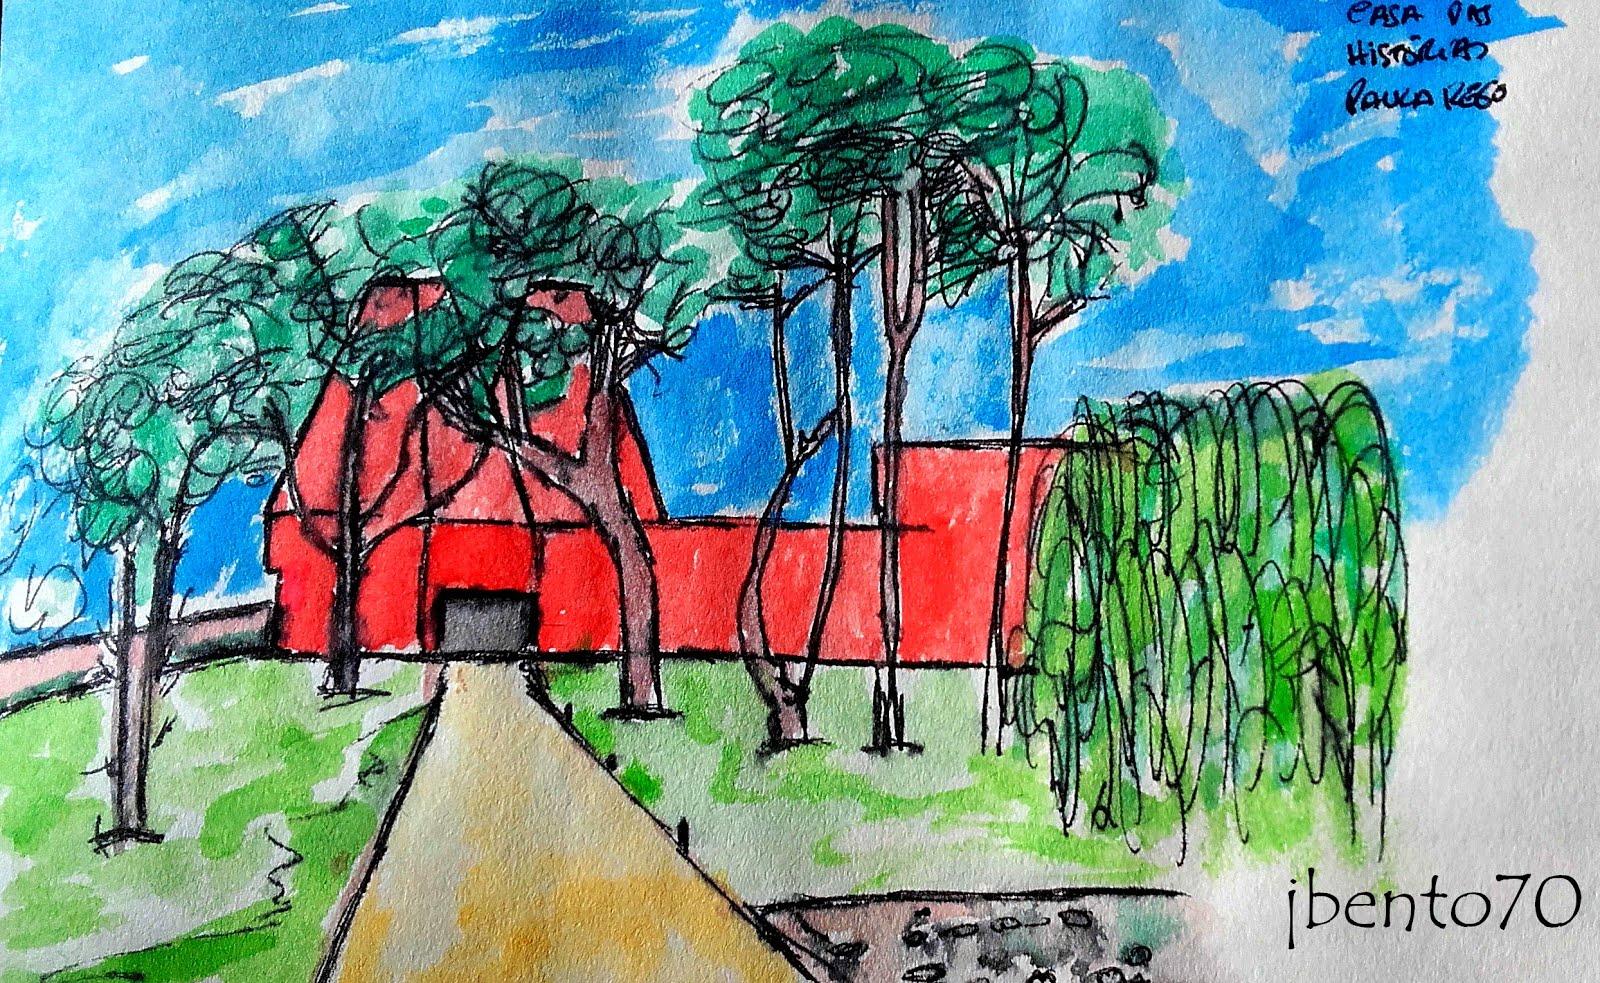 casasemcascais.blogspot.com